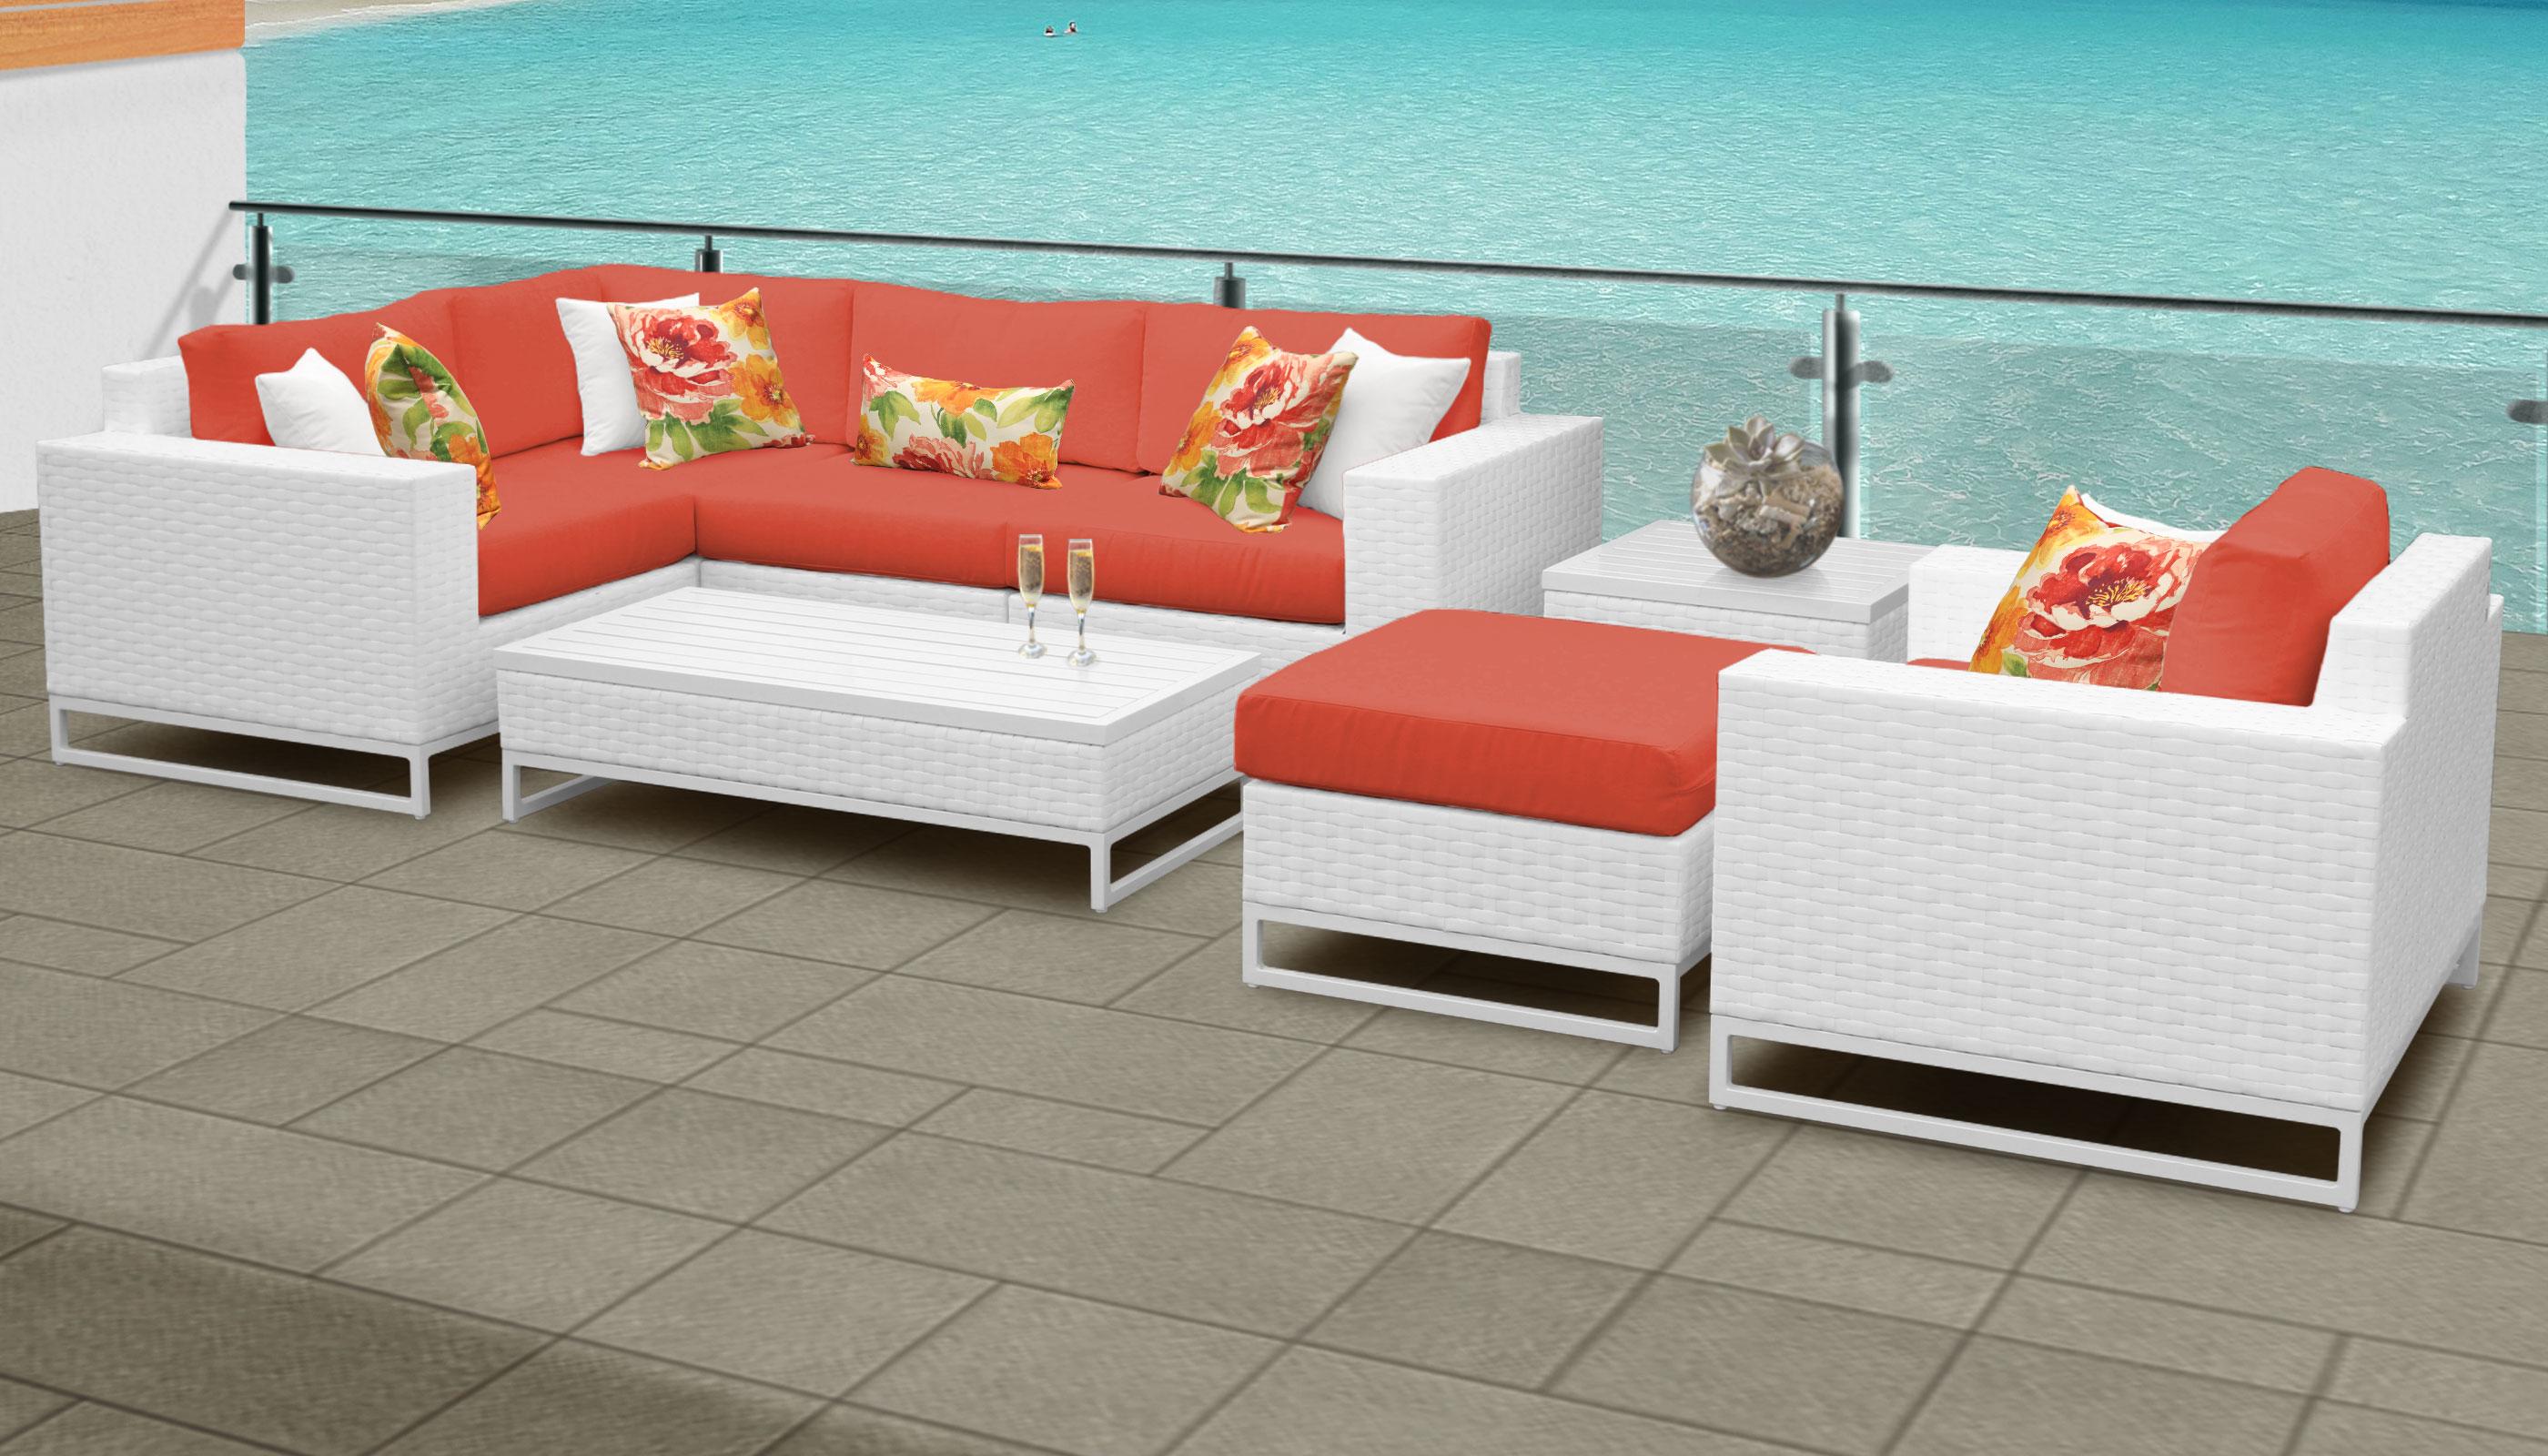 Outdoor Wicker Patio Furniture Set 08g